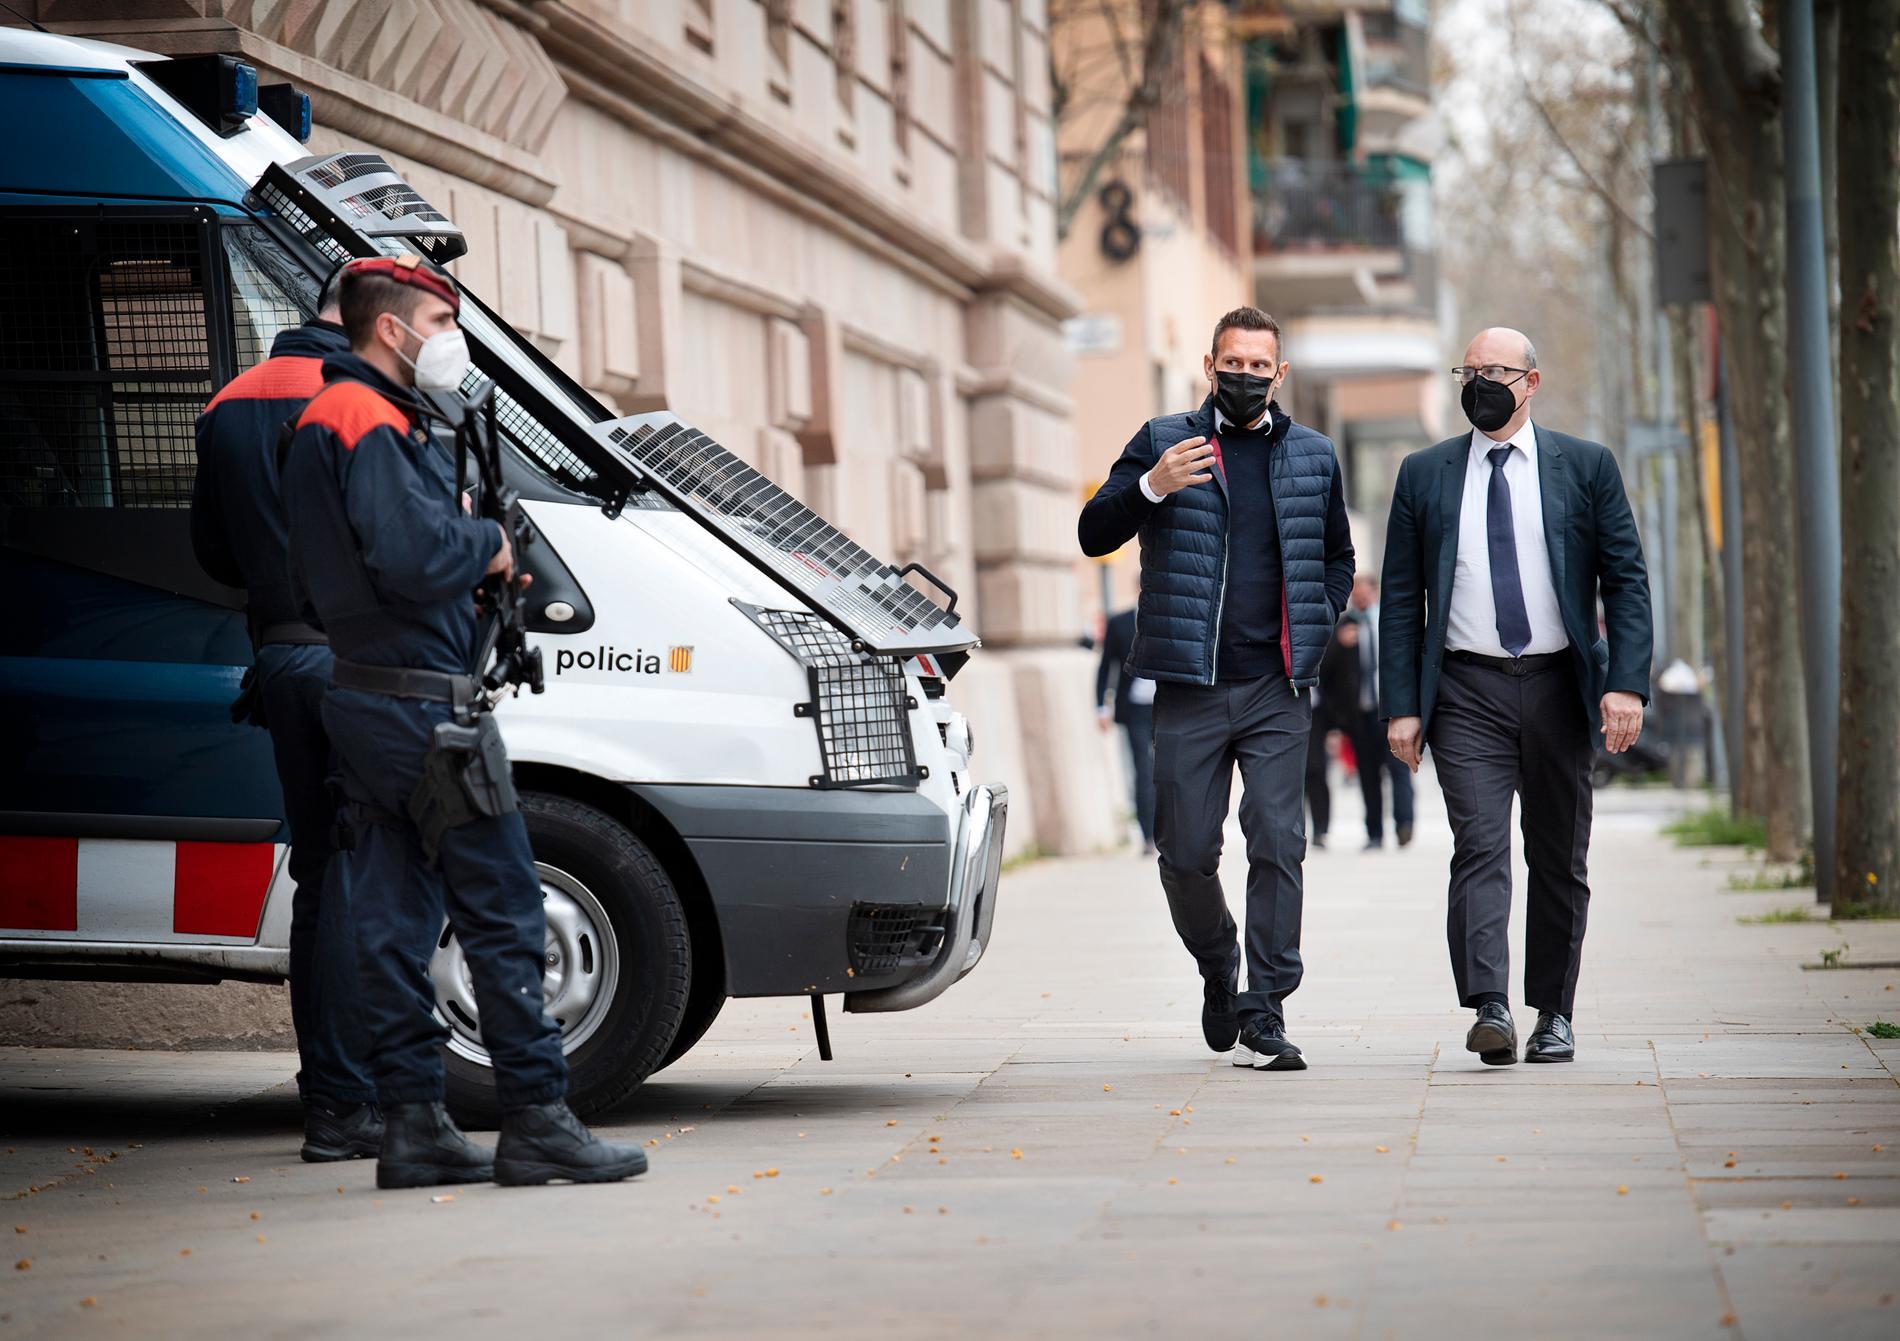 Operation Playa-rättegången drog igång i Barcelona på tisdagen.